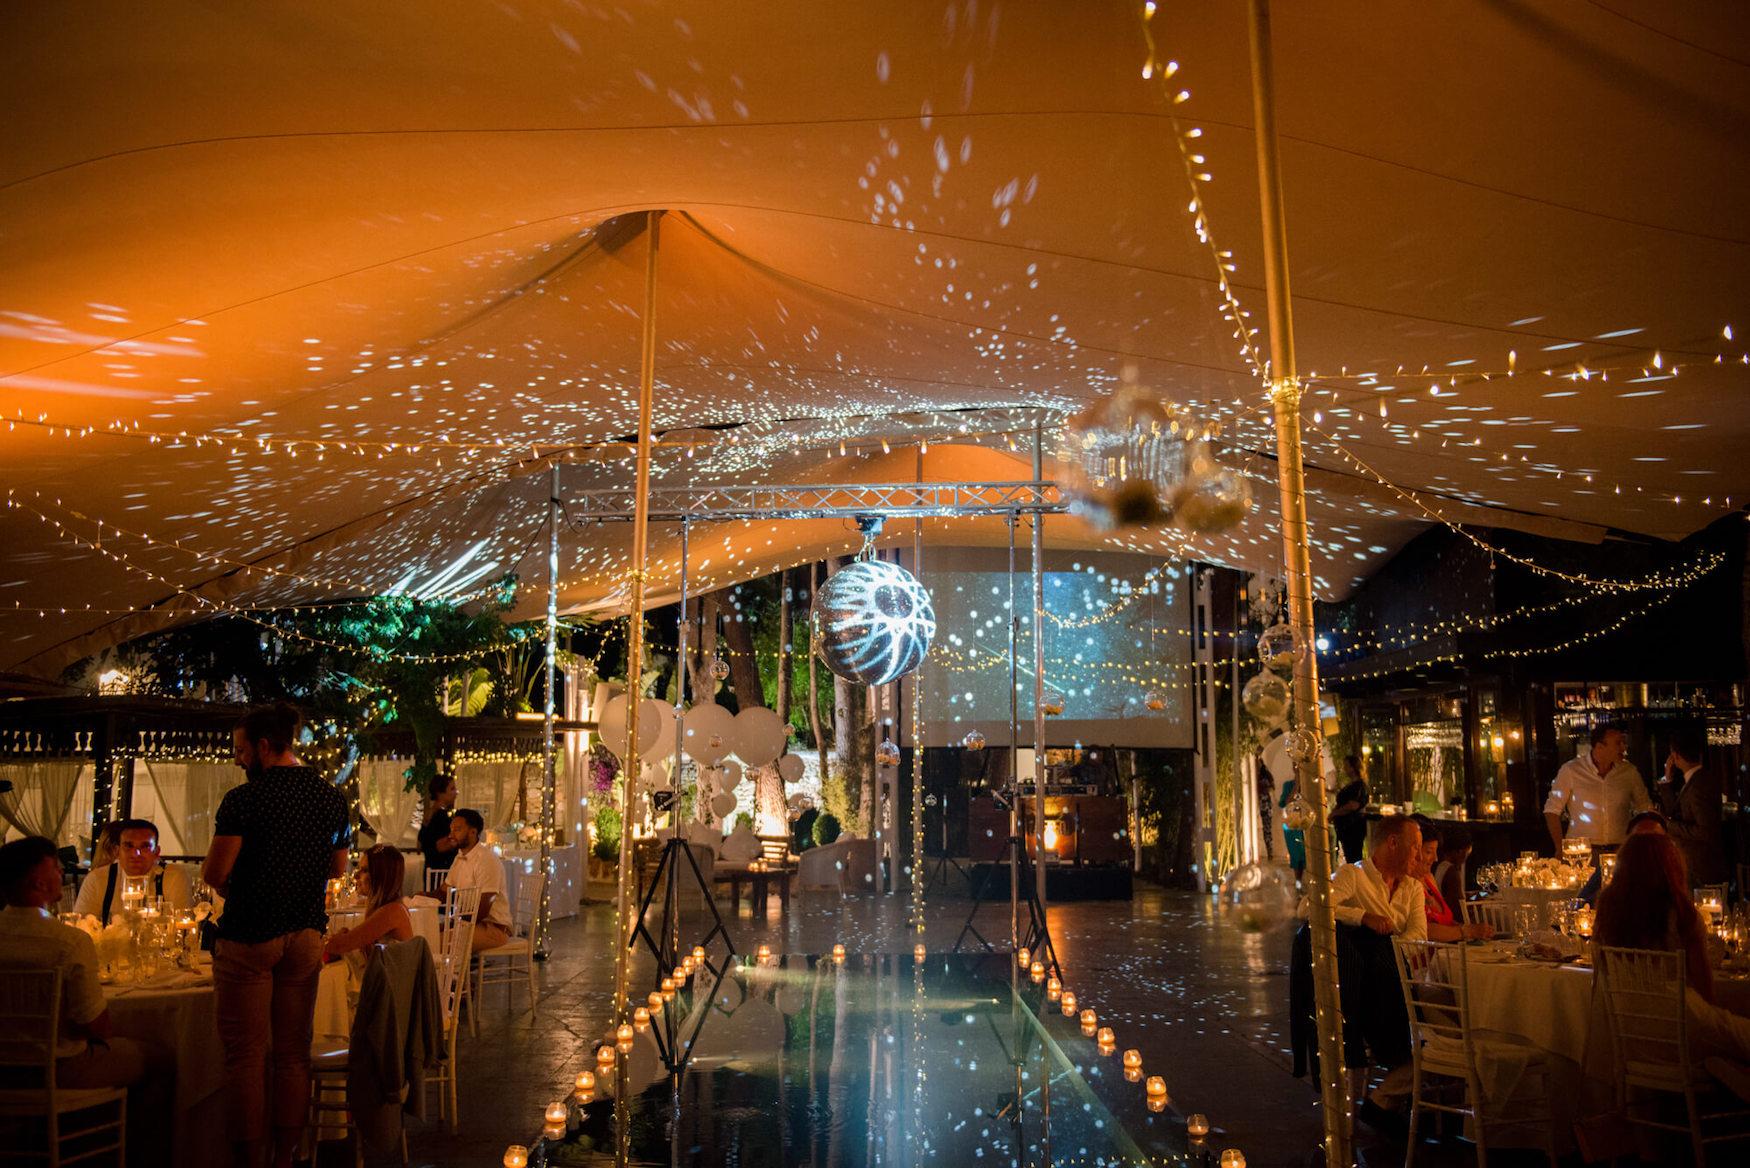 disco ball fairy lights dance floor